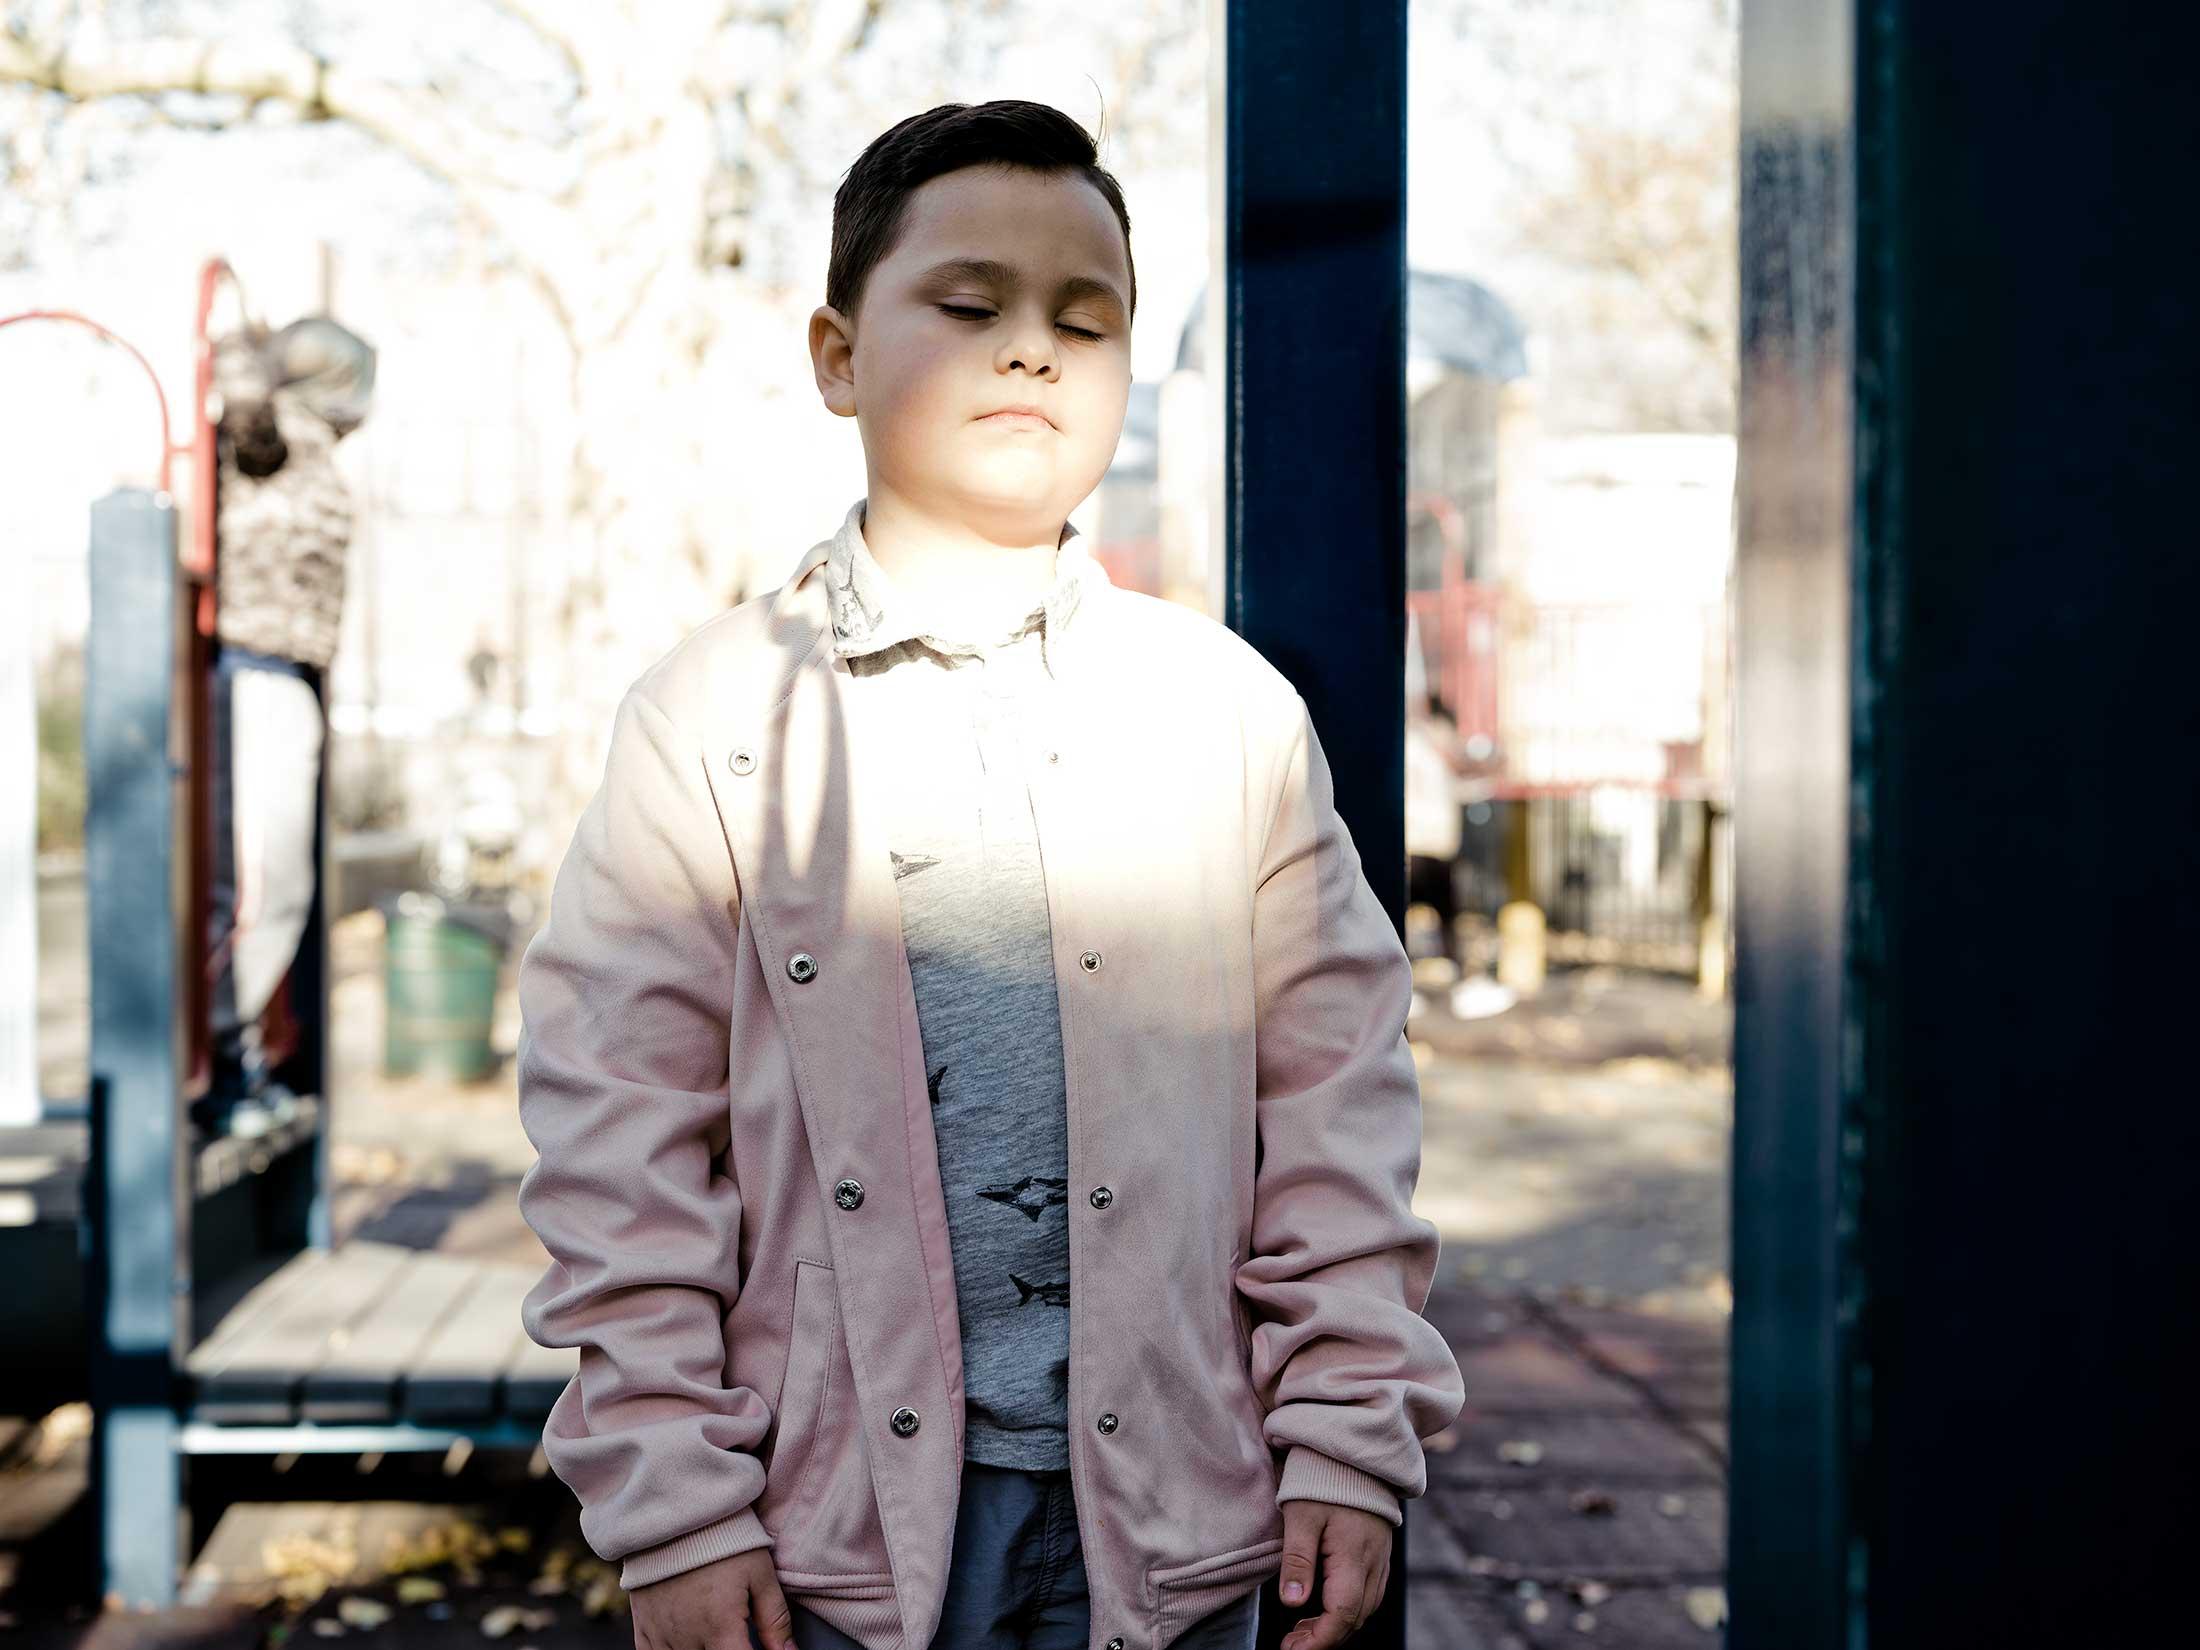 Transgender Boy / Queens, New York